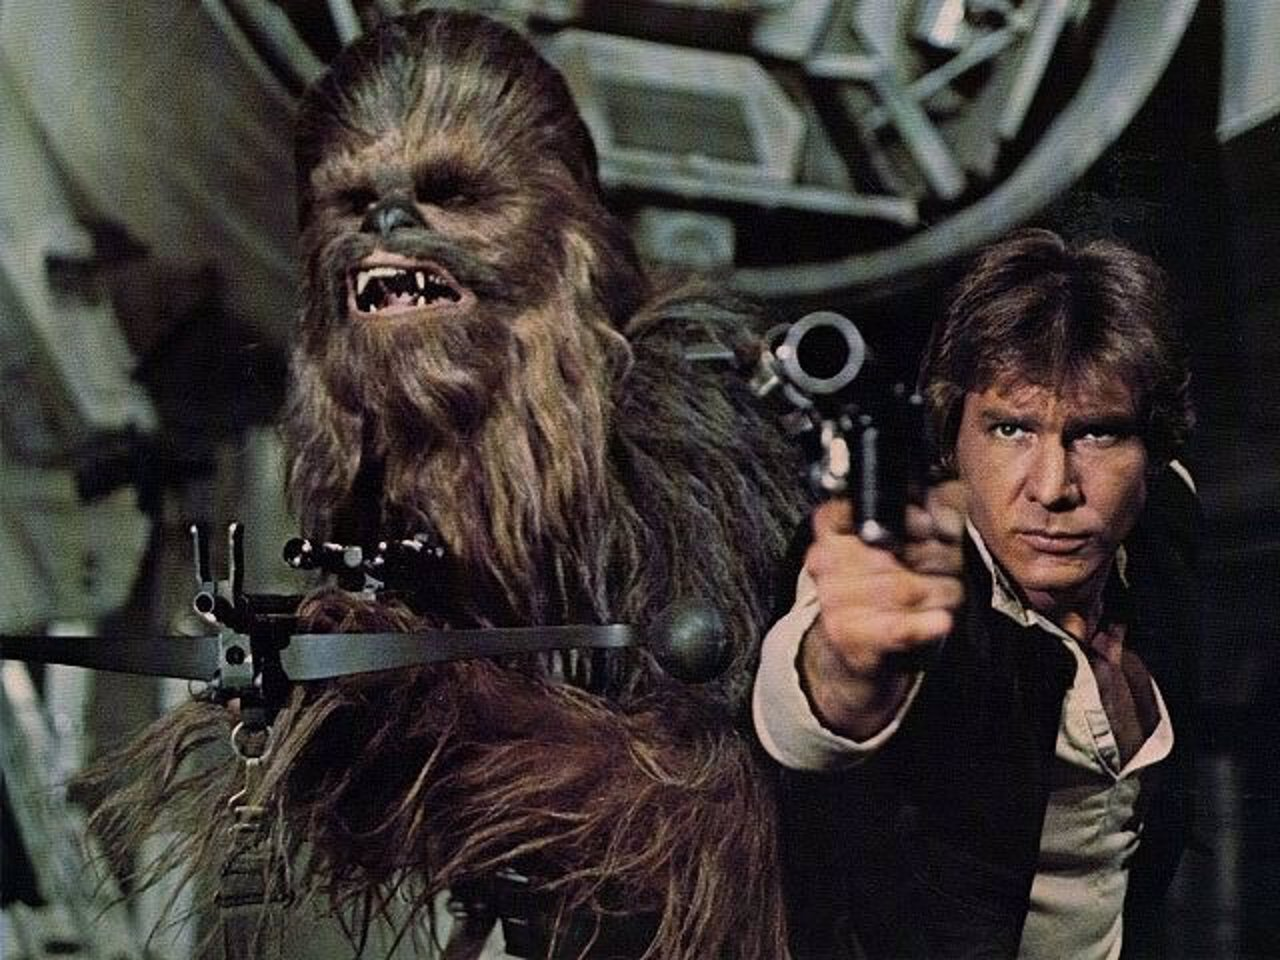 Chewbacca y Han Solo en Star Wars